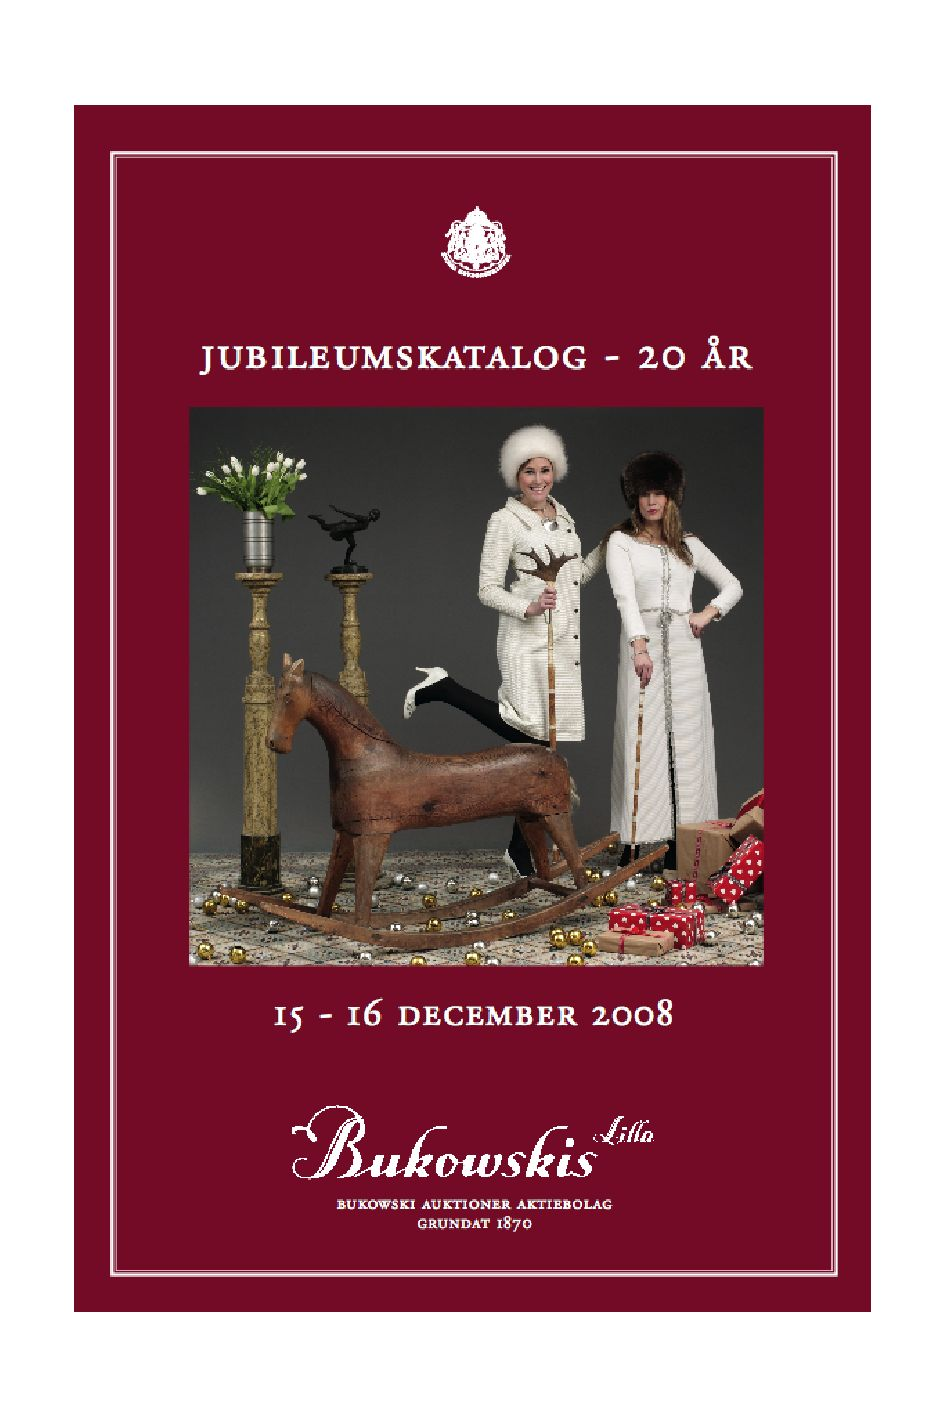 Lilla Bukowskis Jubileumskatalog S186 by Bukowskis - issuu 30c216653862f